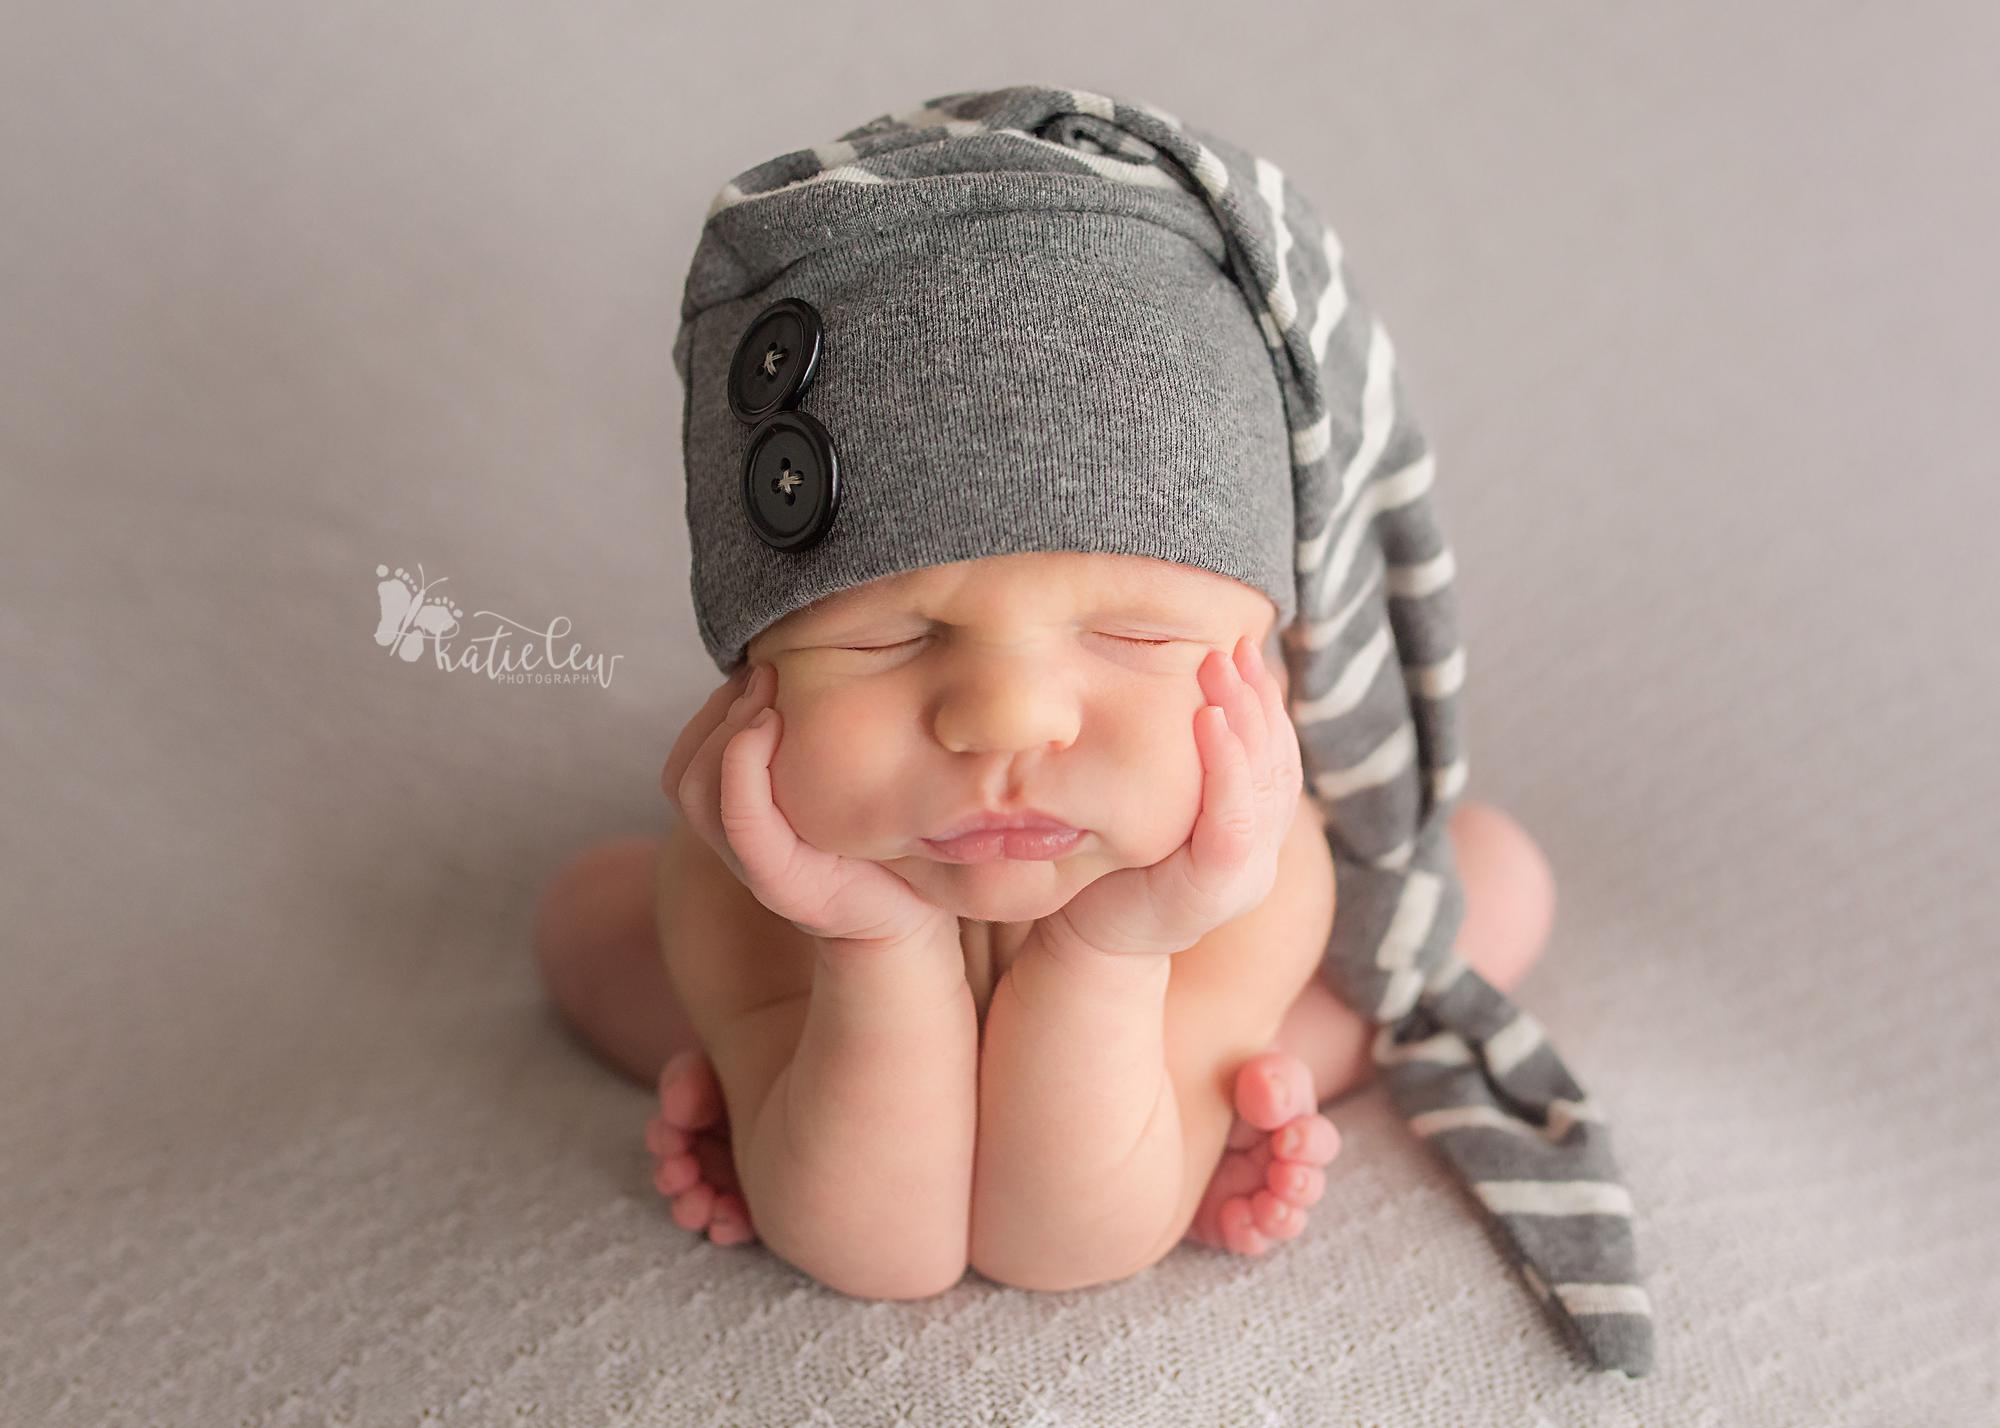 newborn baby boy wearing a striped hat